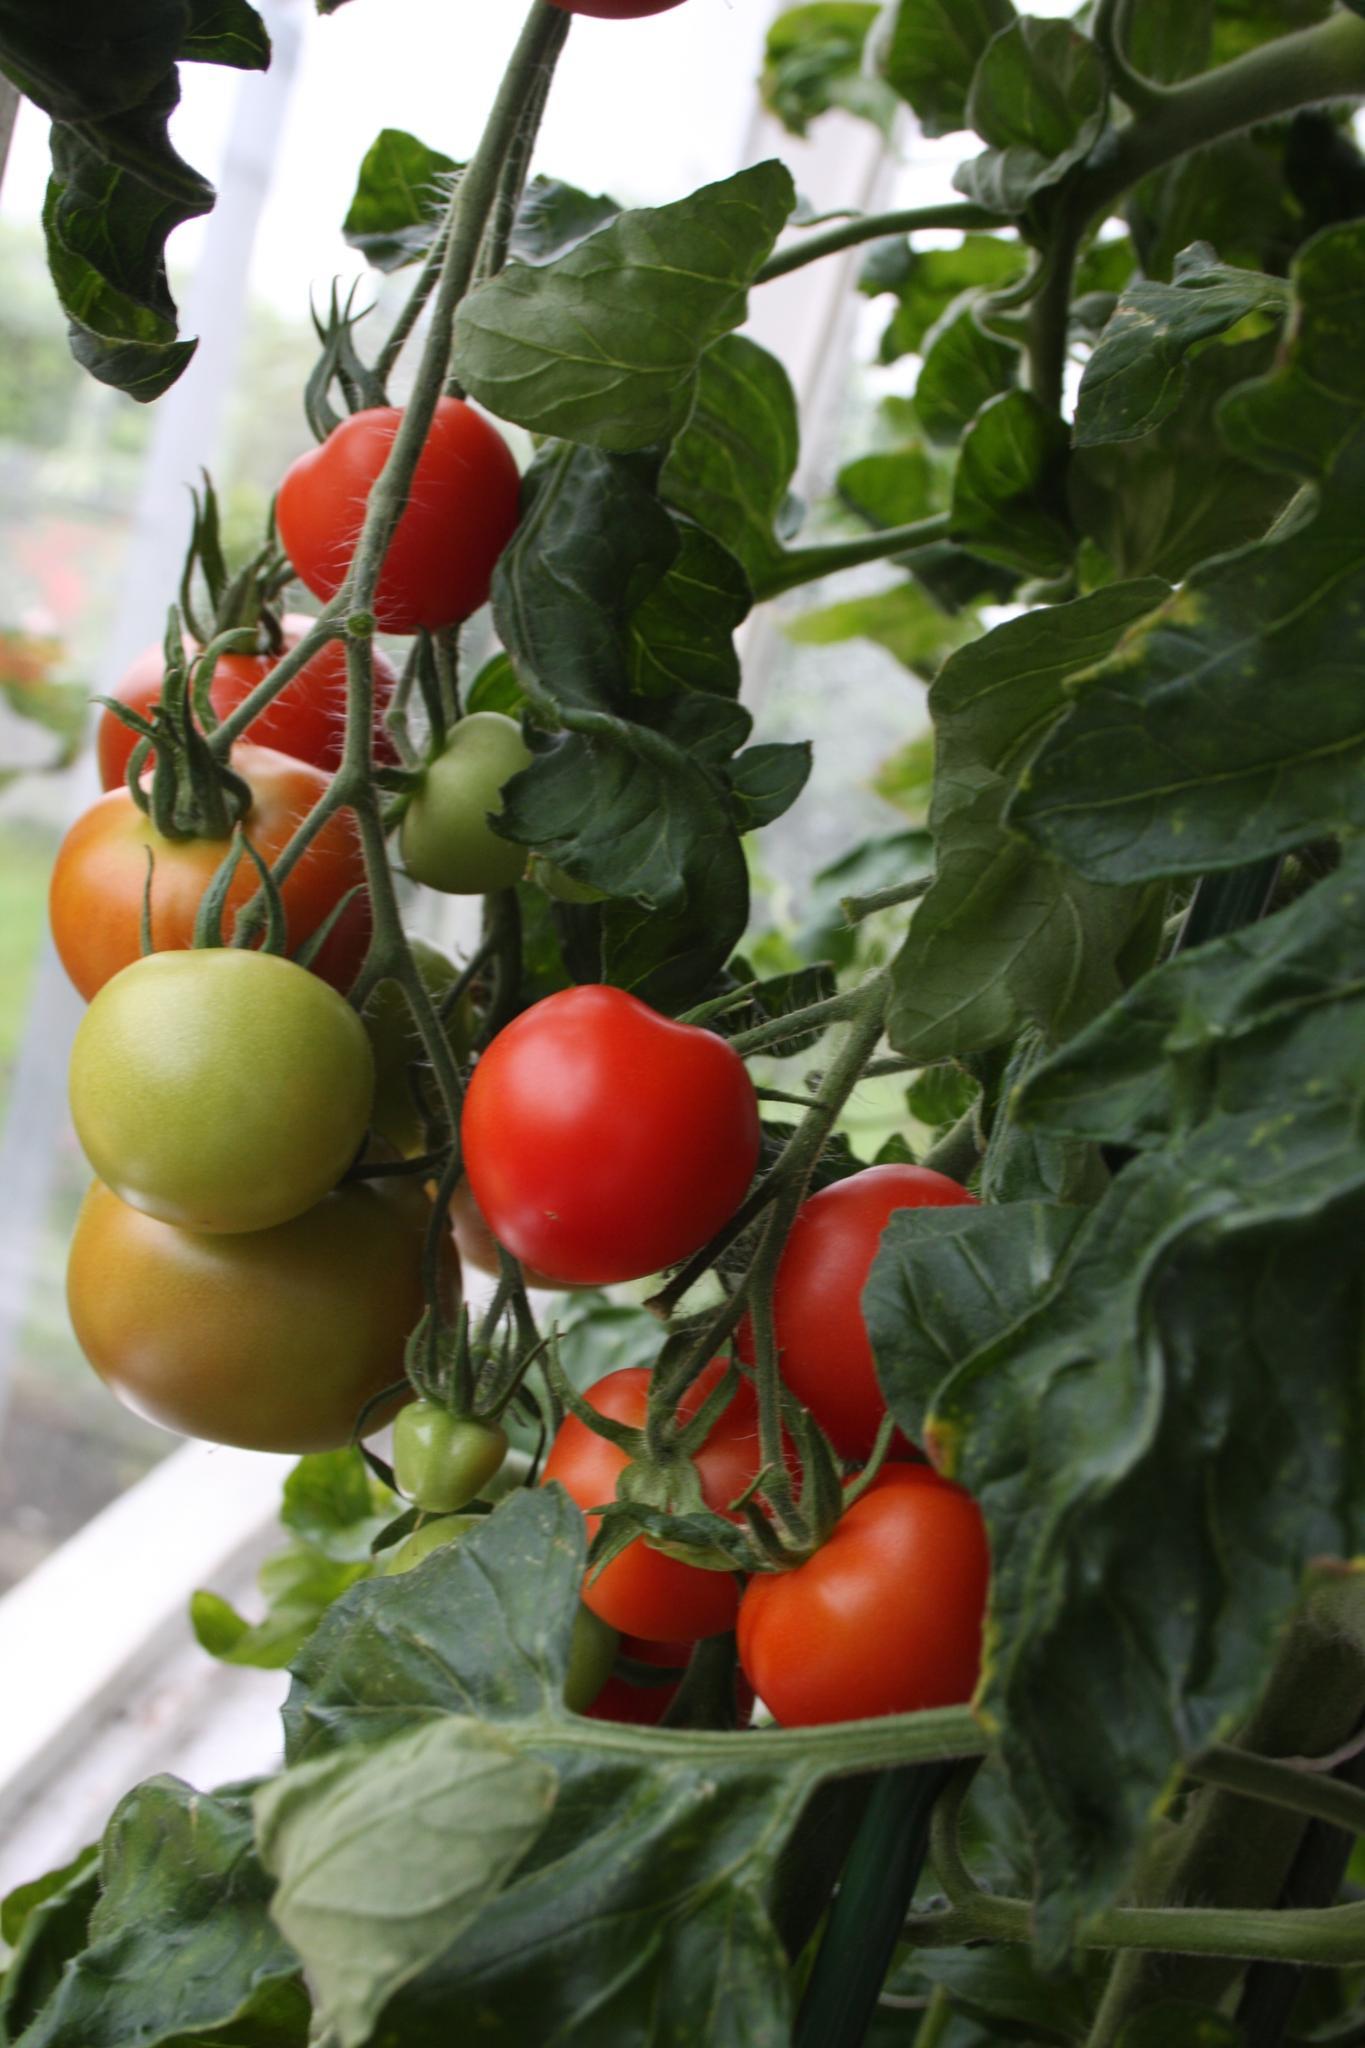 Home grown tomatoes by Amanda Gardner